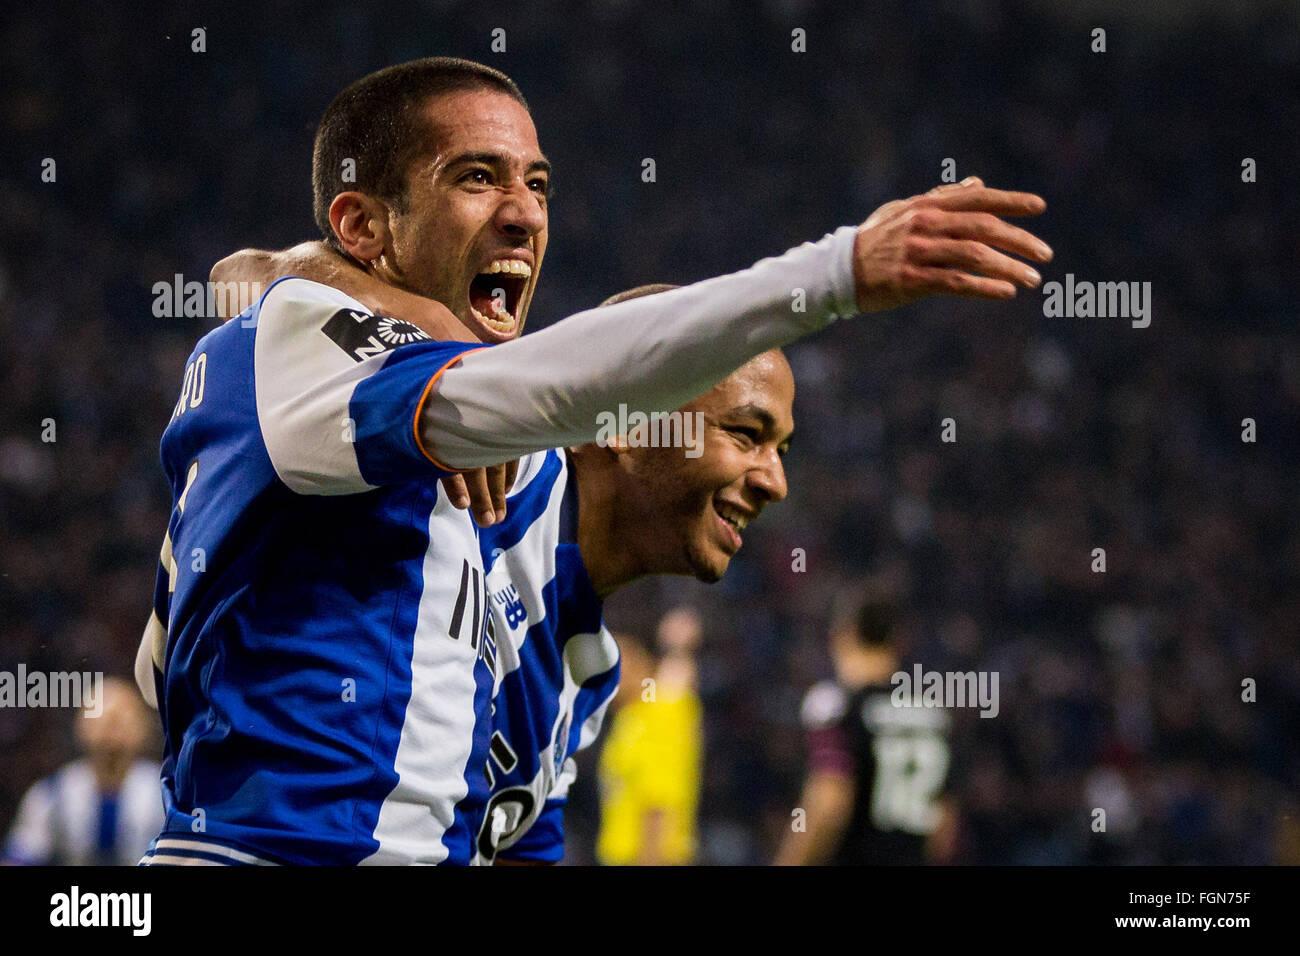 Dragon Stadium, Portugal. 21st February, 2016. FC Porto's player Evandro celebrates after scoring goal, during - Stock Image